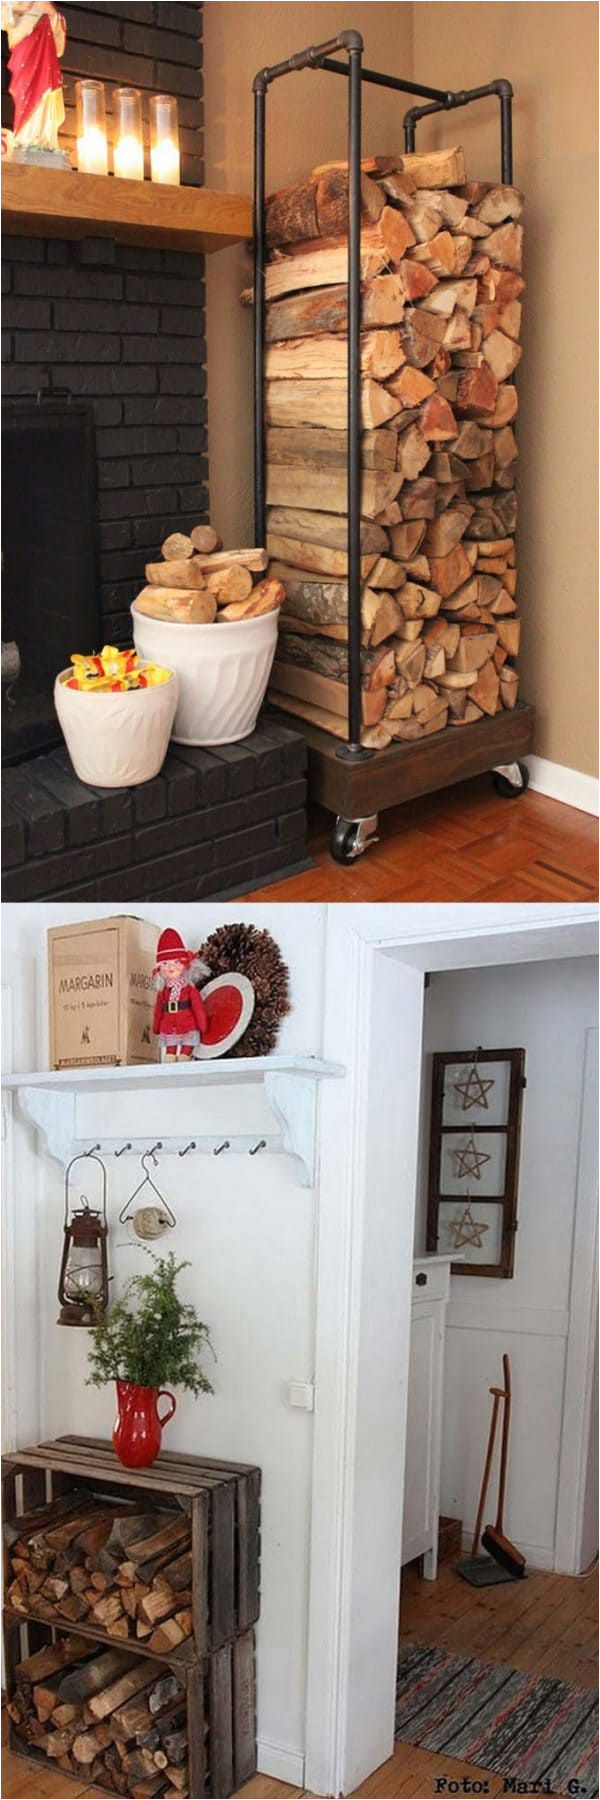 15 firewood rack storage ideas apieceofrainbow 7